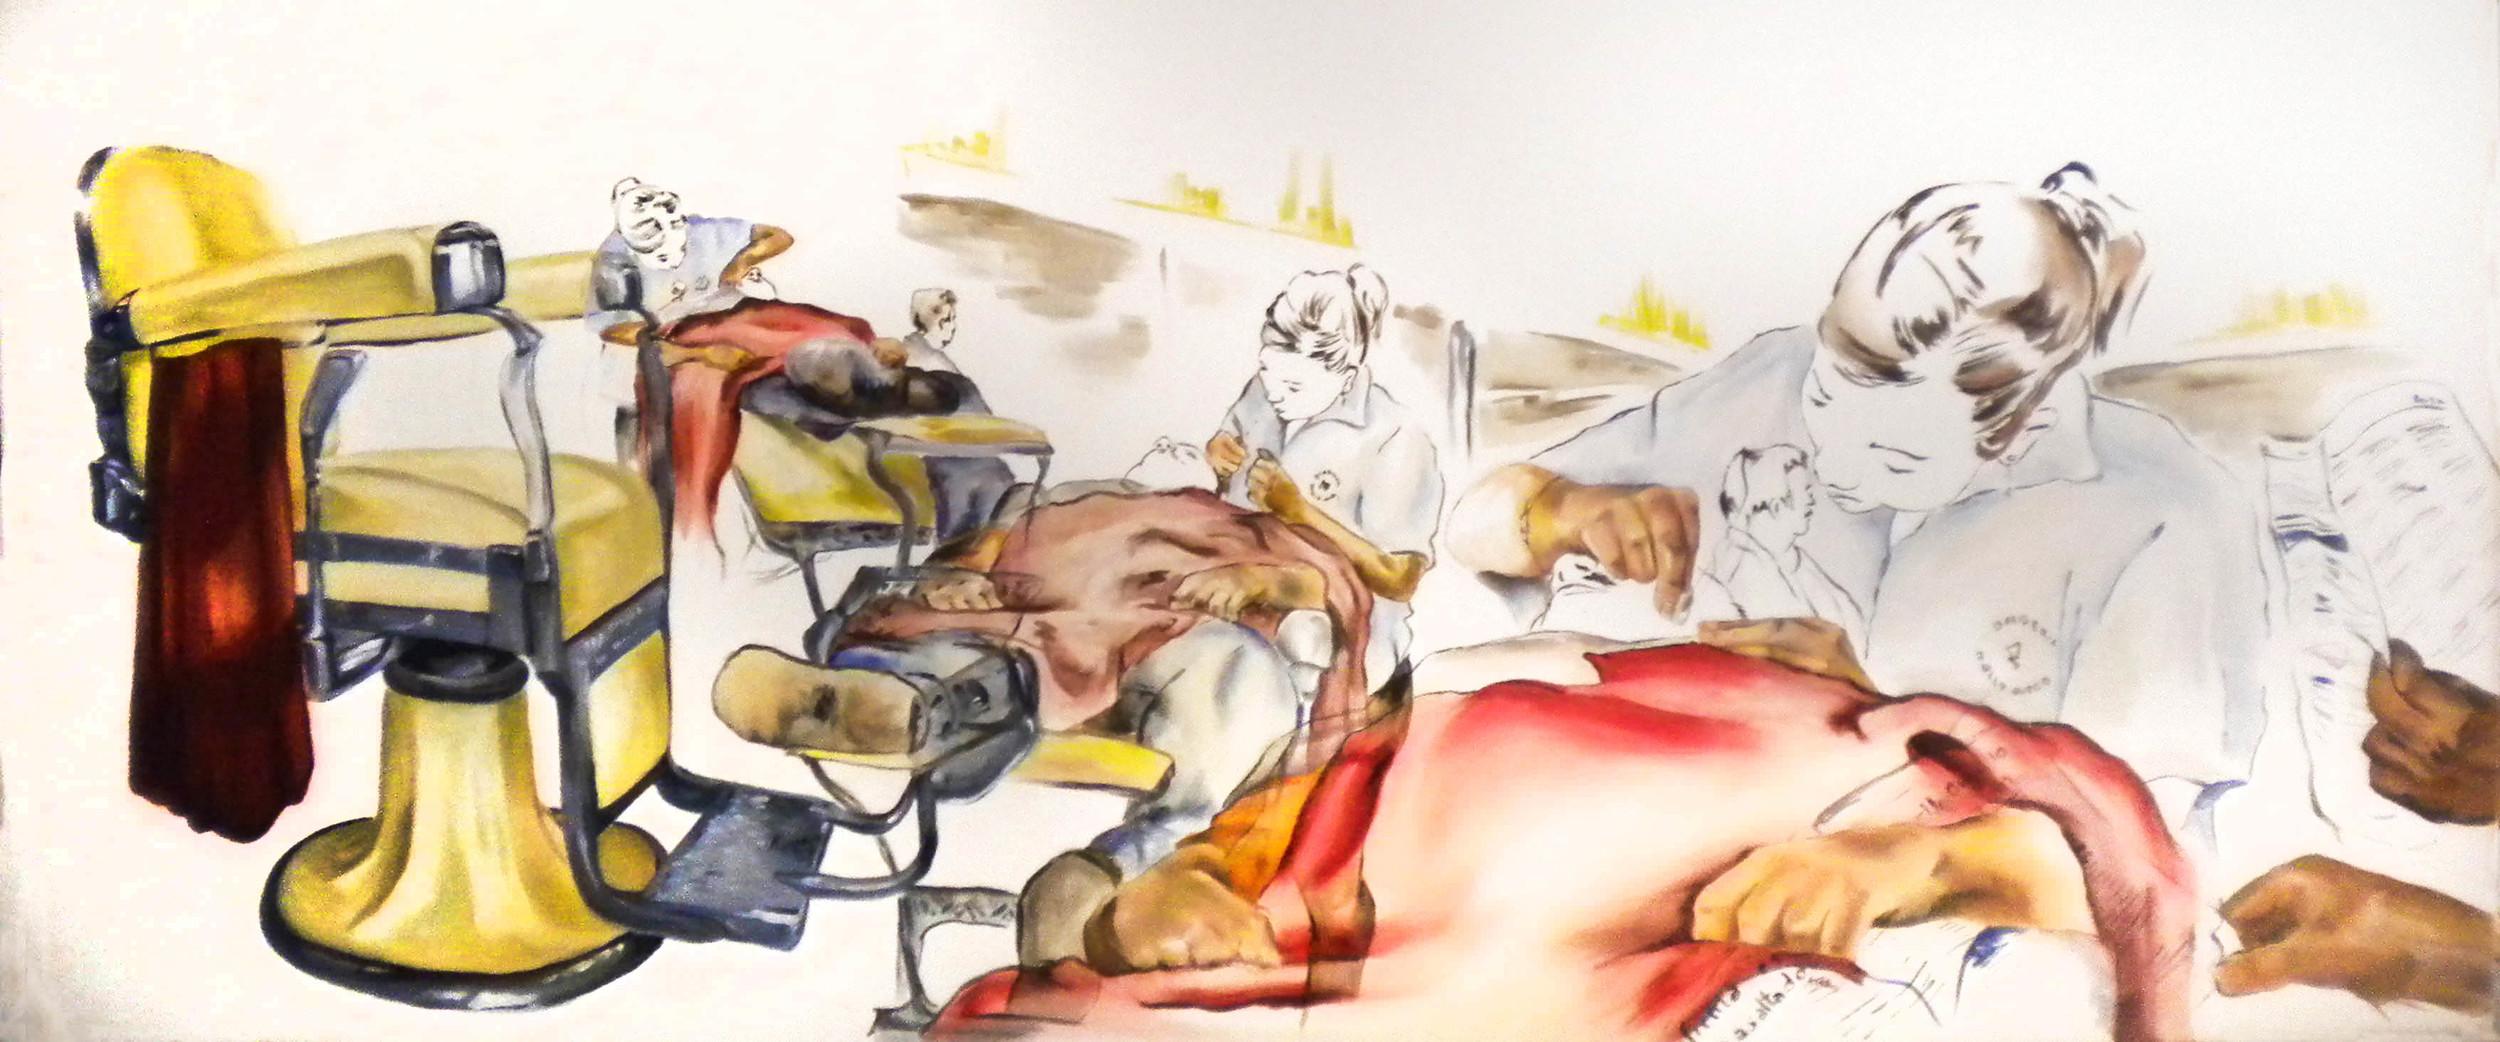 Barberia Holywood  2010 oil on canvas 80 x 190 cm